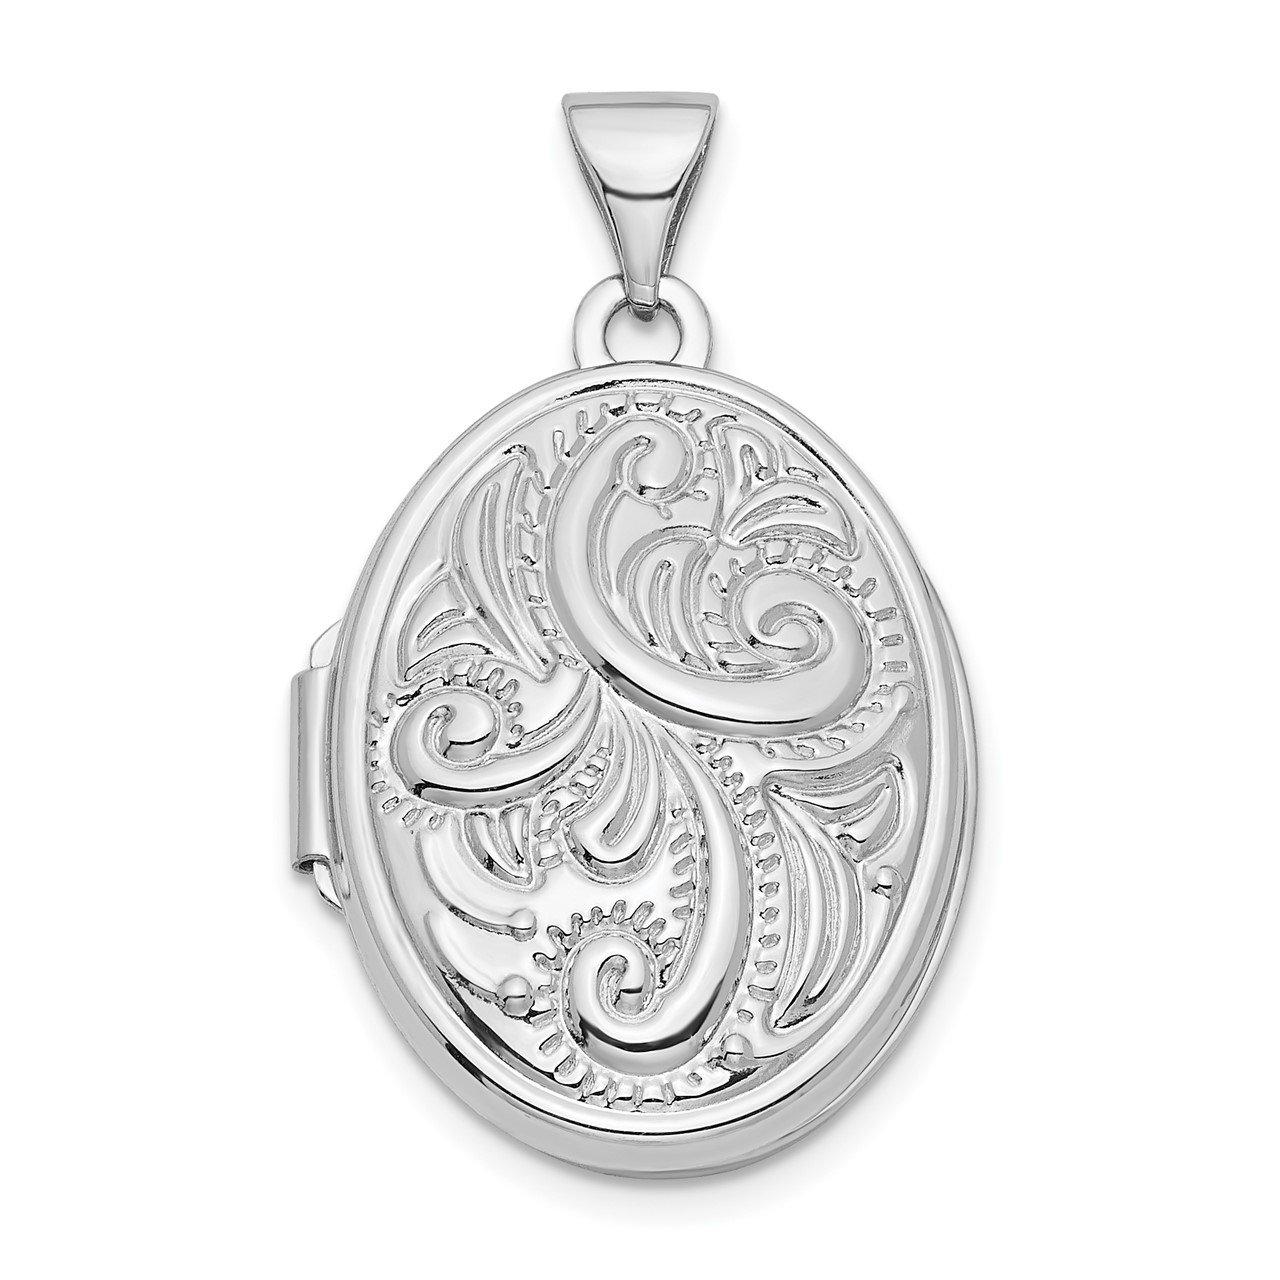 14k White Gold Swirl Design 21mm Oval Locket